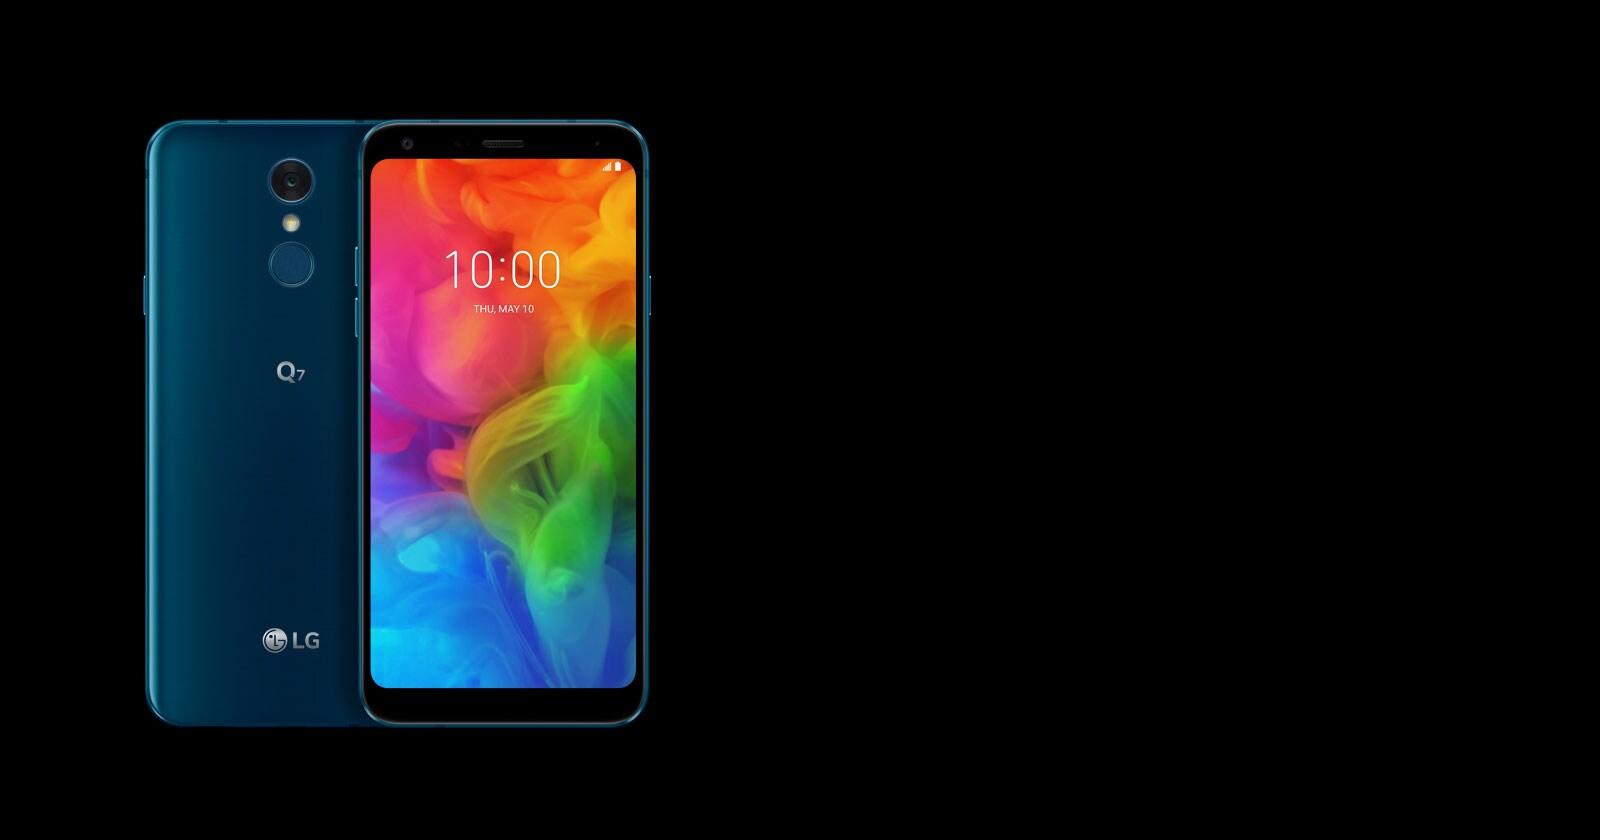 LG_Q7_Dual_SIM_prime_Sleek-&-balanced-design_07-10-2018_desktop1